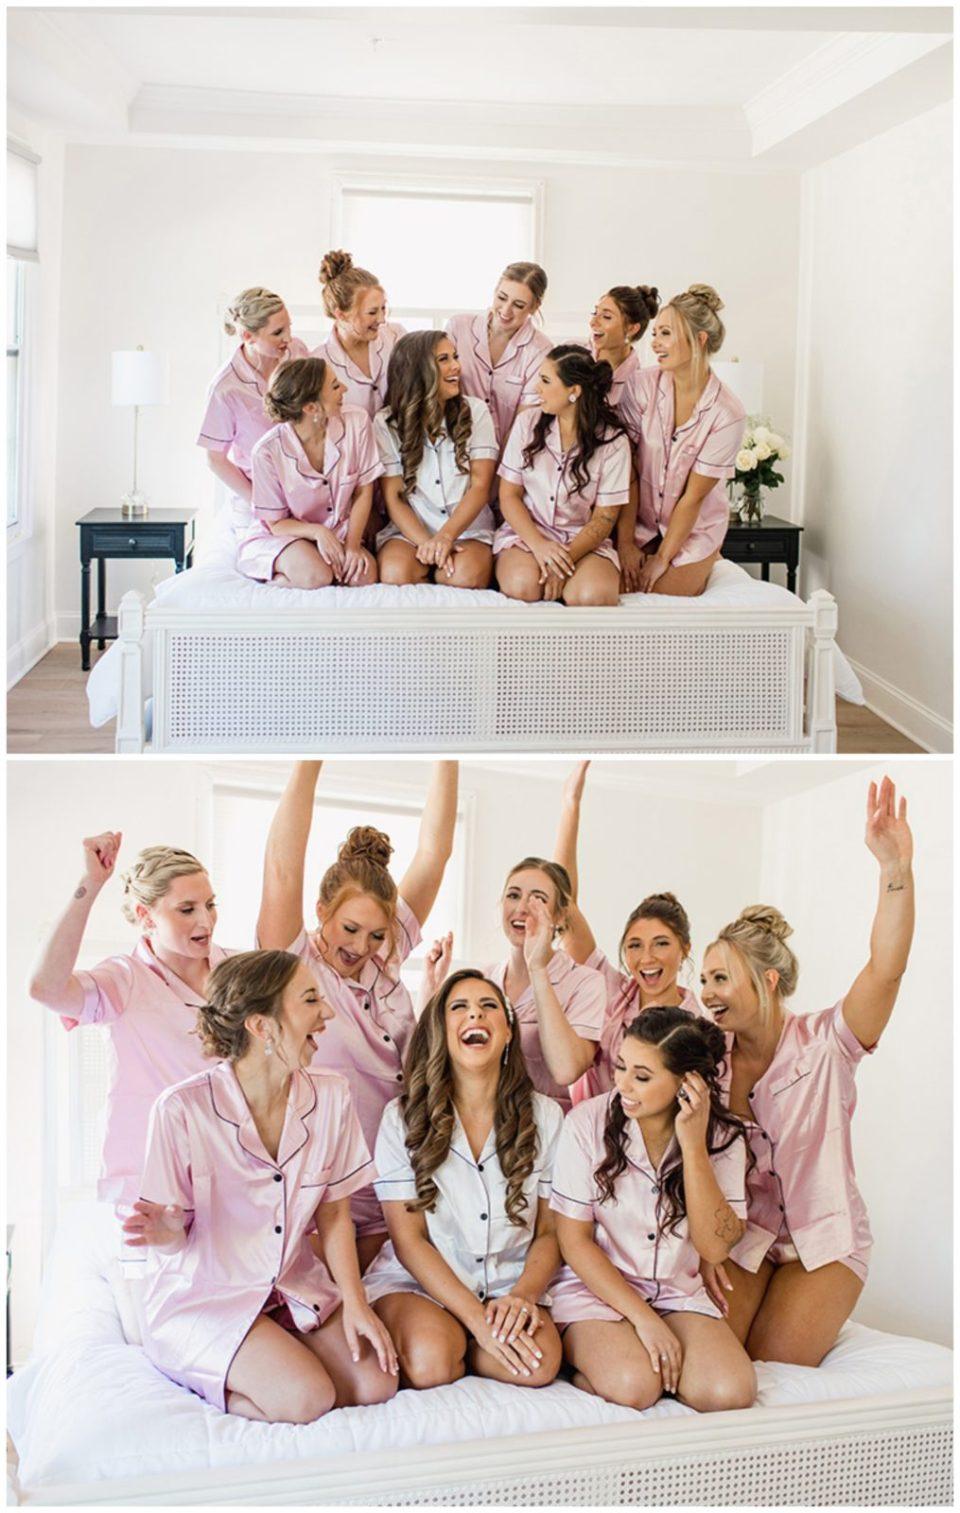 bridesmaids getting ready in matching pink silk pajamas